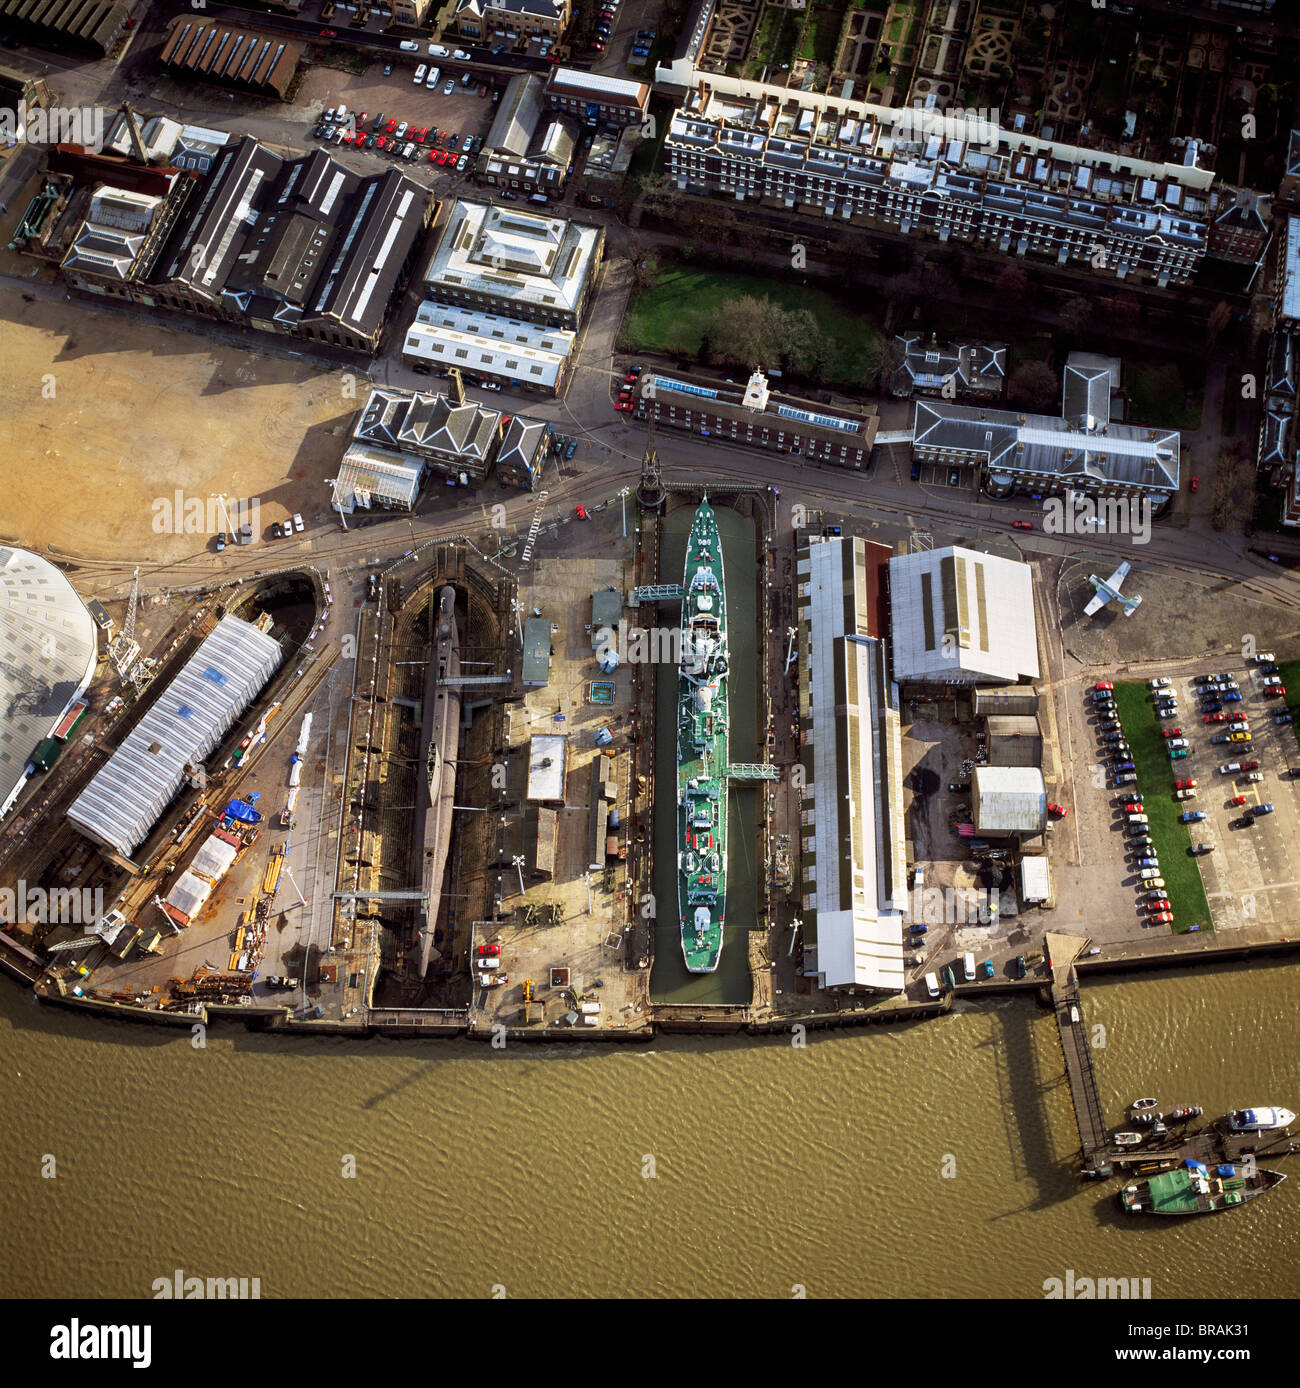 Aerial image of Chatham Historic Dockyard, a maritime museum, Chatham, Kent, England, United Kingdom, Europe - Stock Image